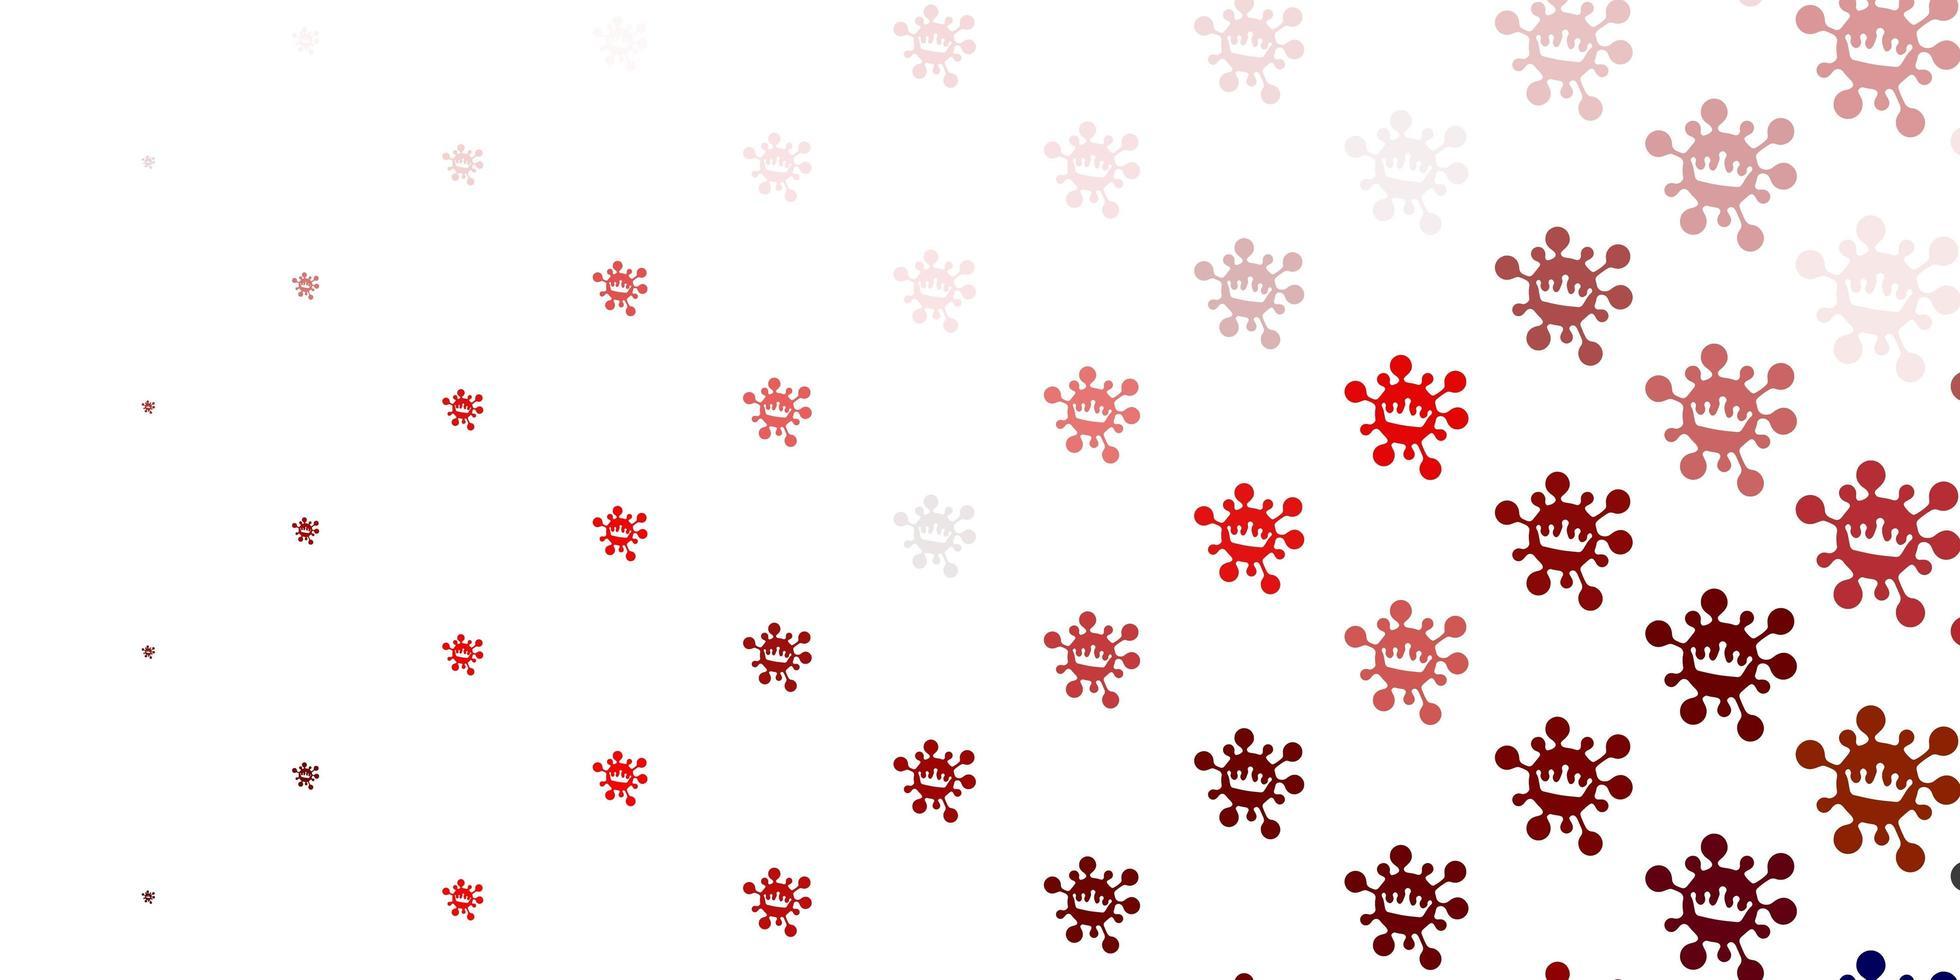 telón de fondo rojo claro con símbolos de virus. vector